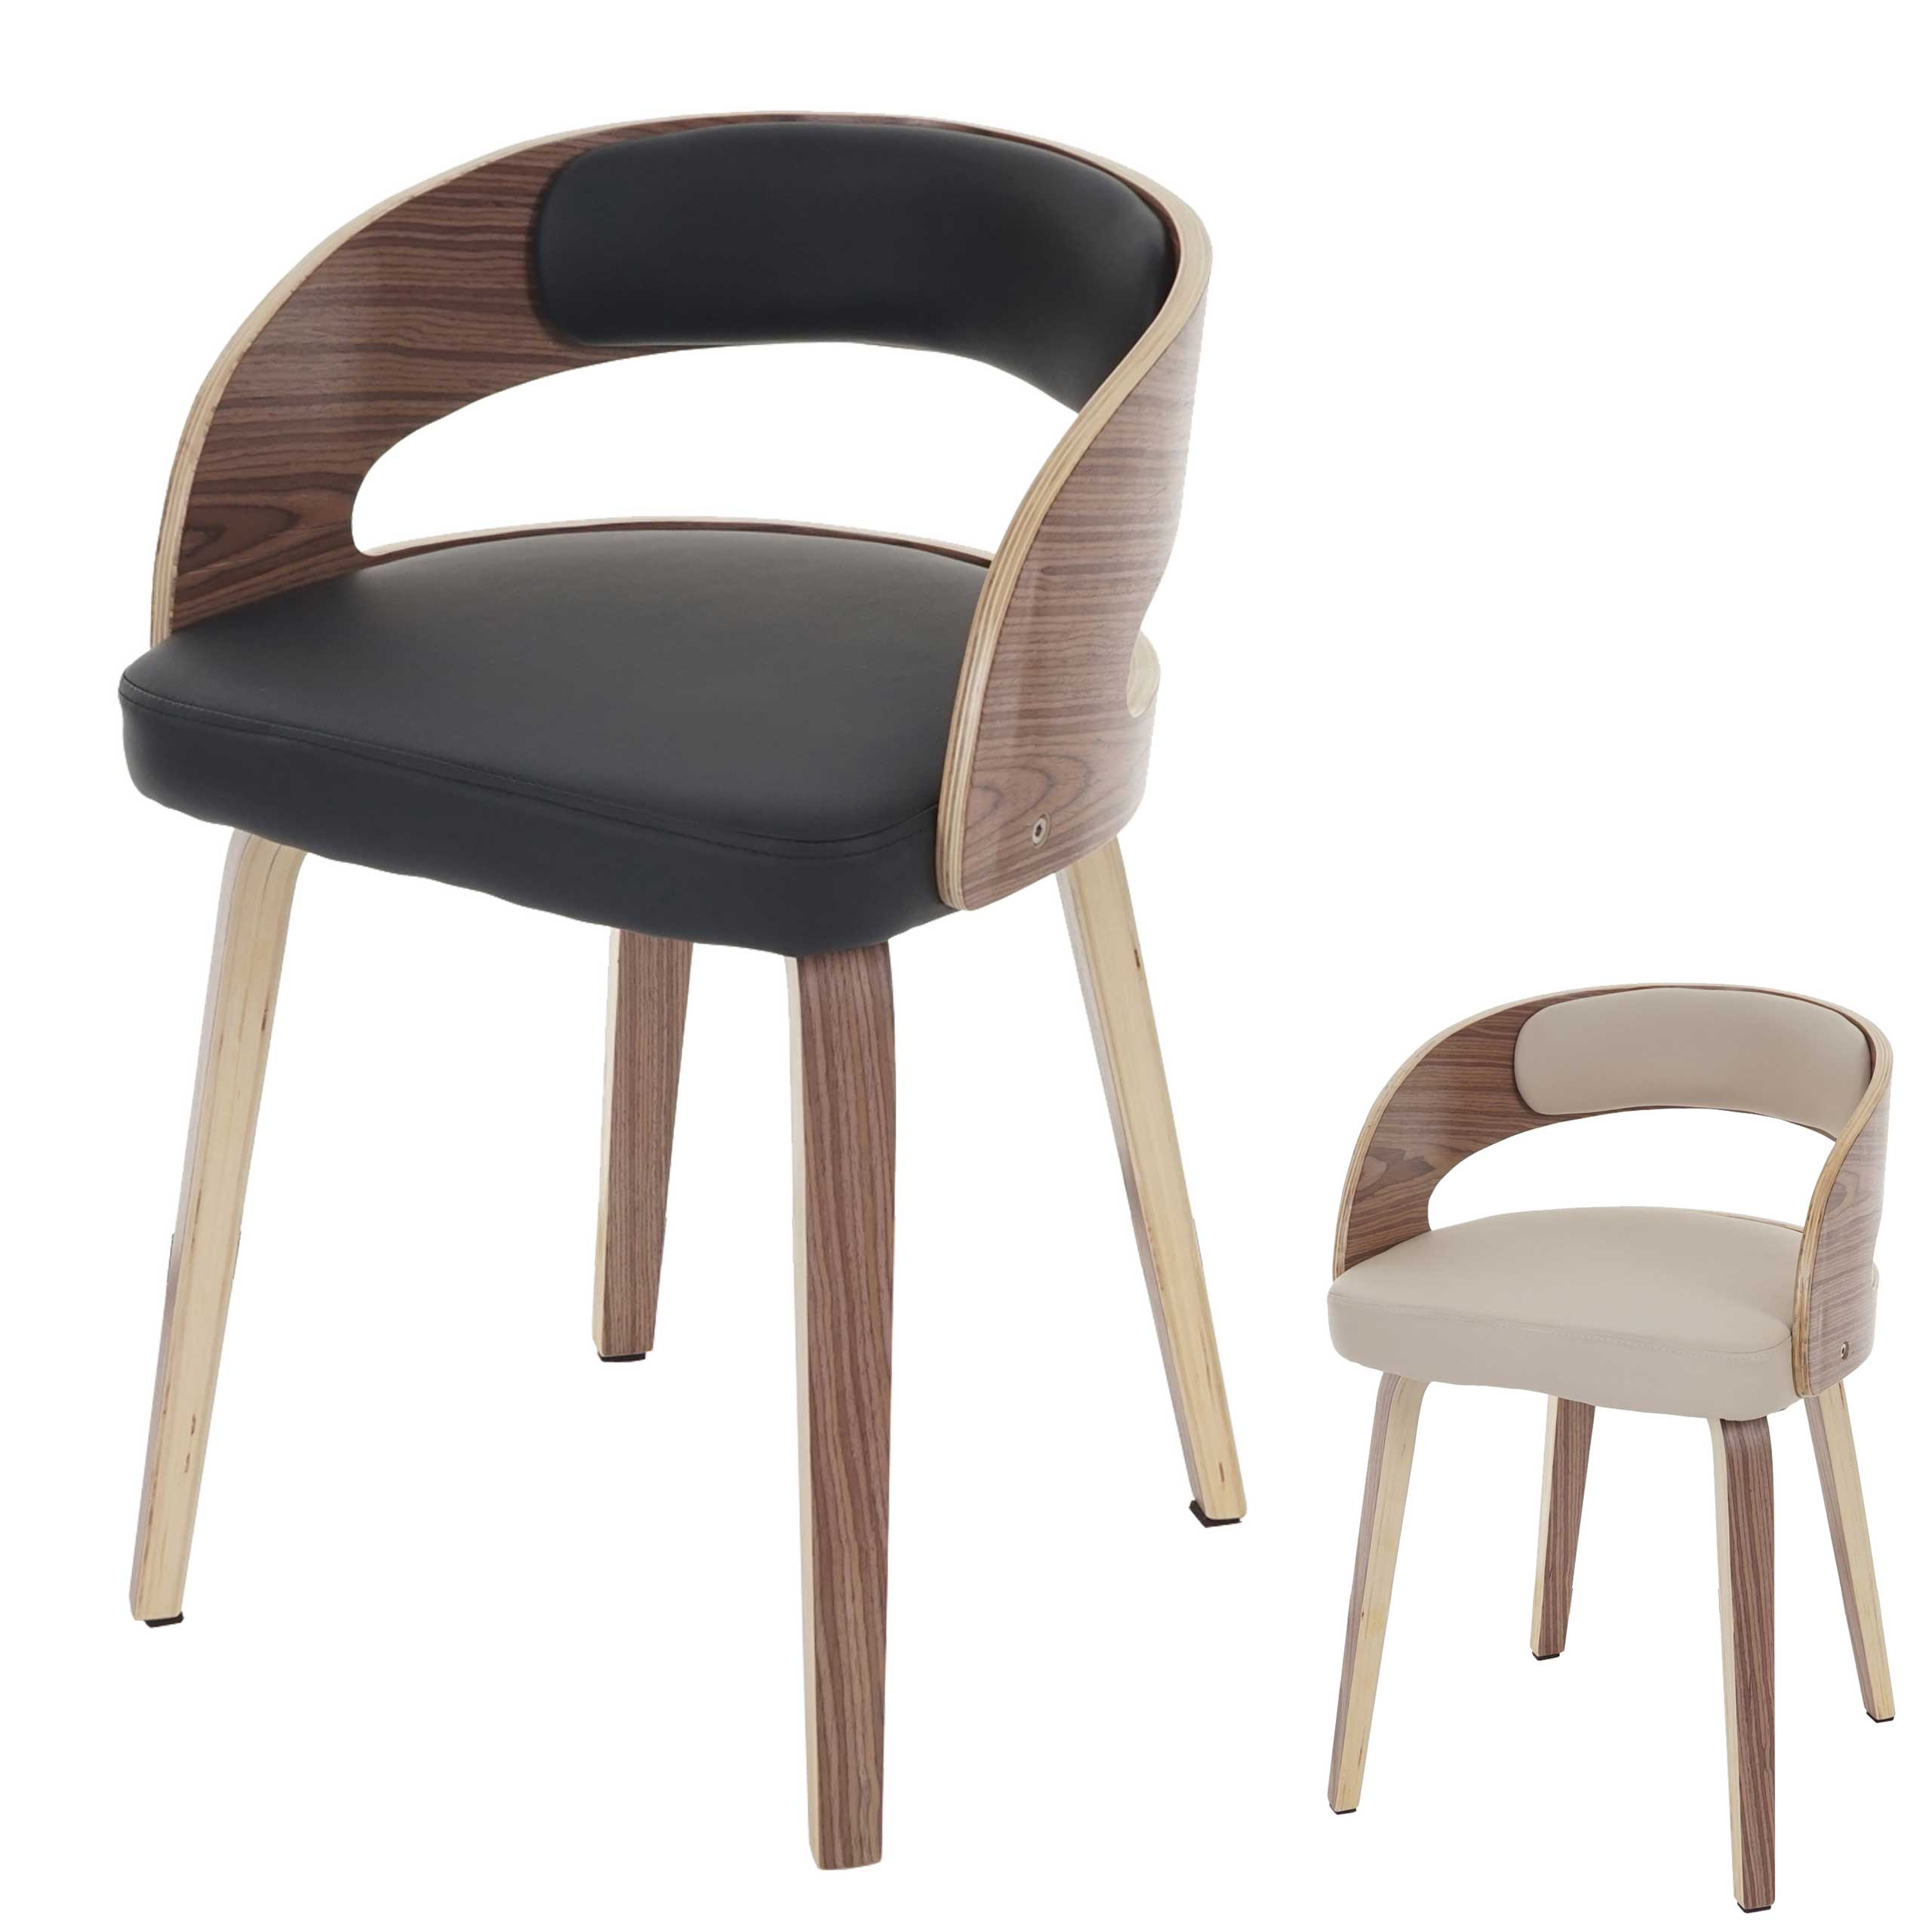 Stuhl mit hoher sitzh he preisvergleiche for Hoher stuhl mit armlehne